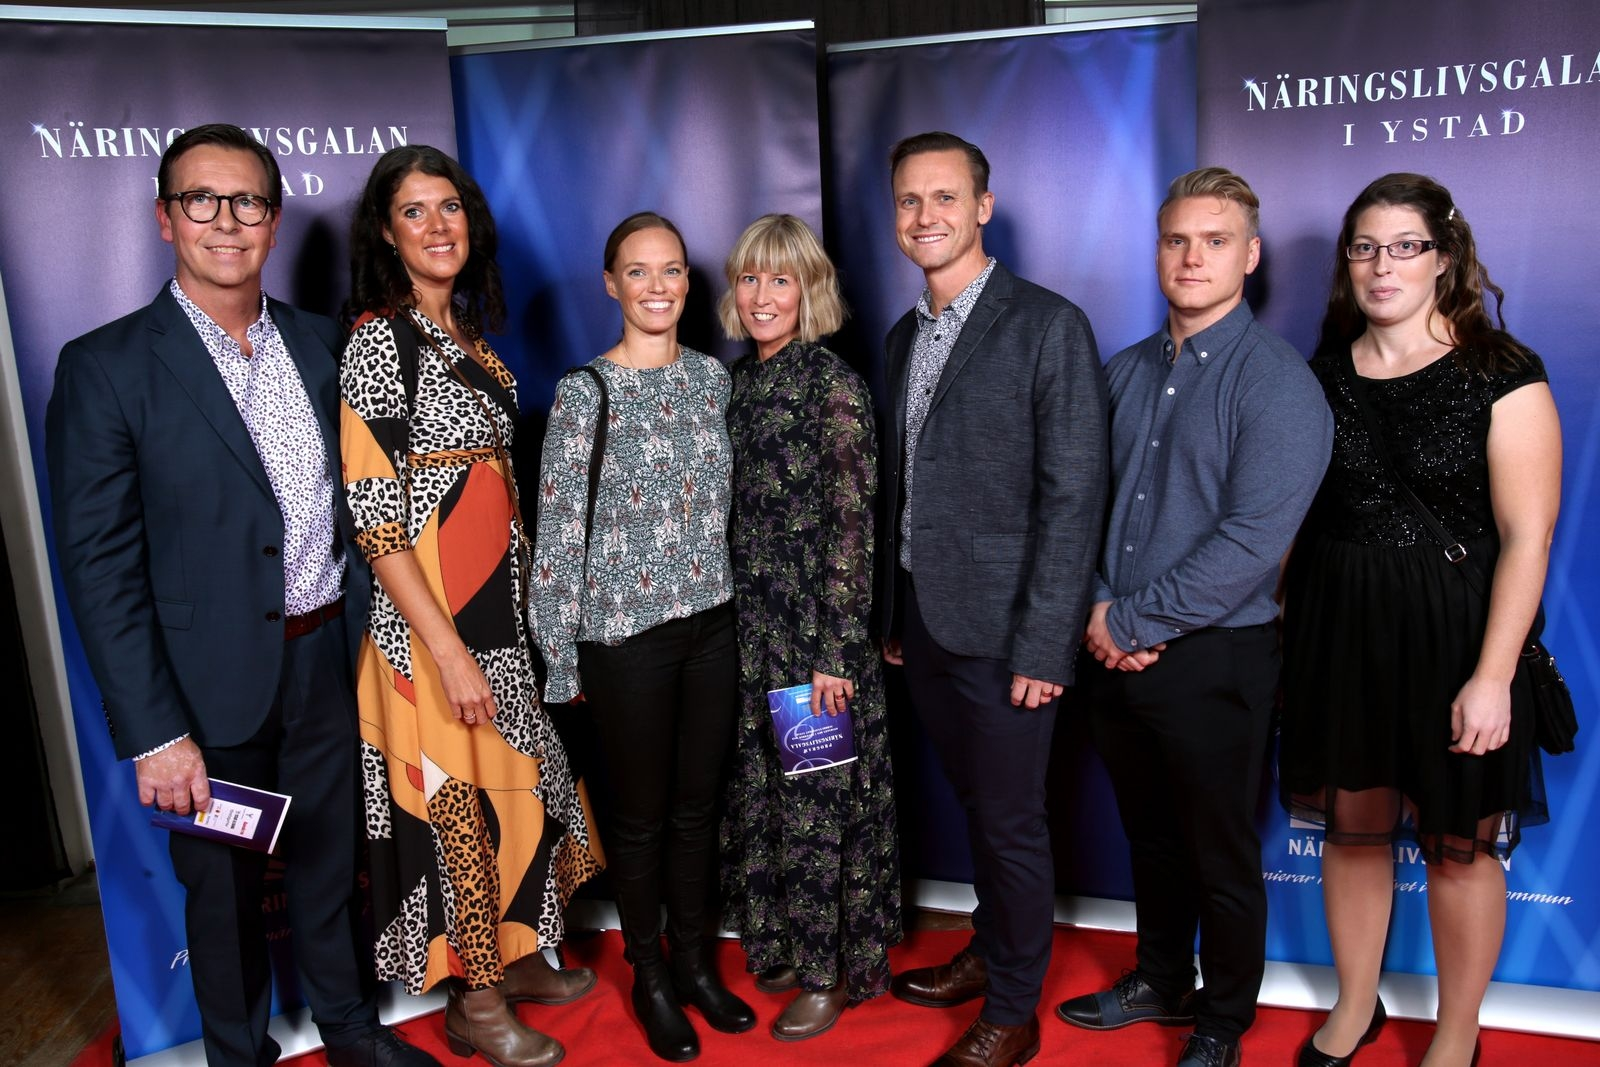 Jesper Lindgren, Caroline Lindgren, Therese Kleman, Annika Bendroth, Björn Bendroth, Joakim Persson och Laura Nilsson, JL Fysiocenter AB